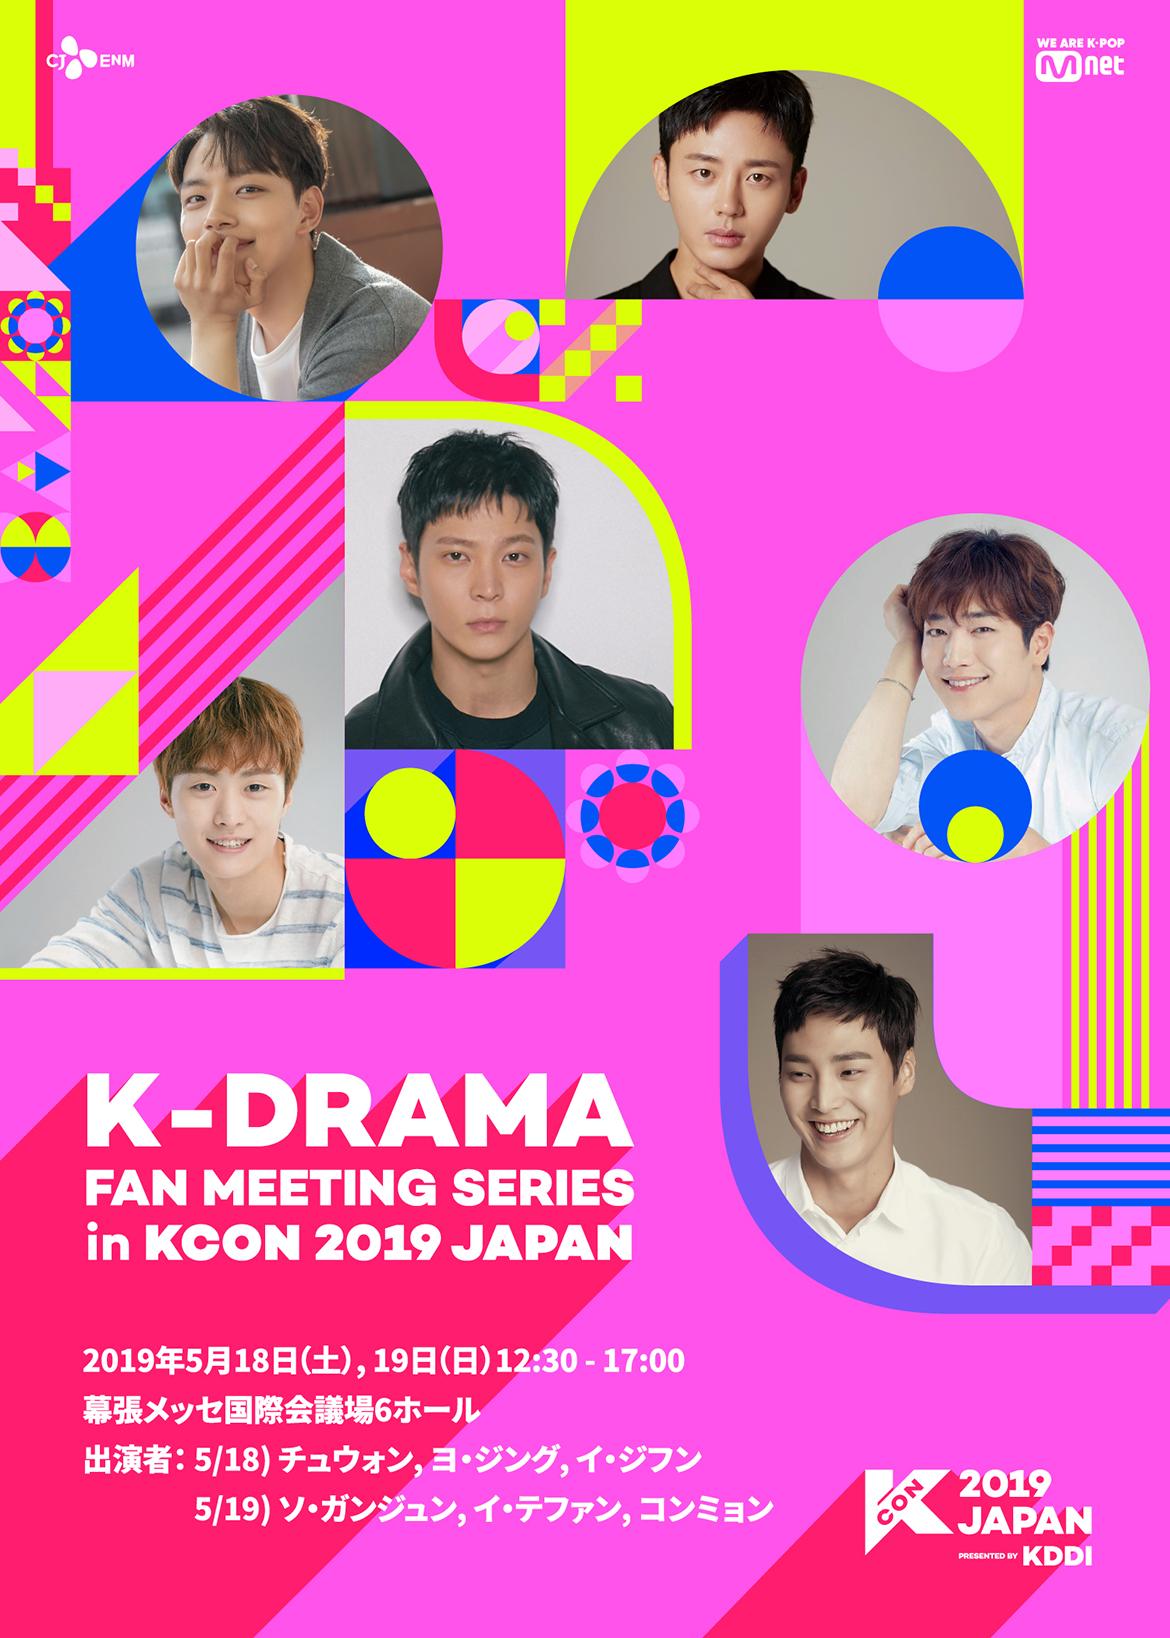 K-DRAMA EVENT